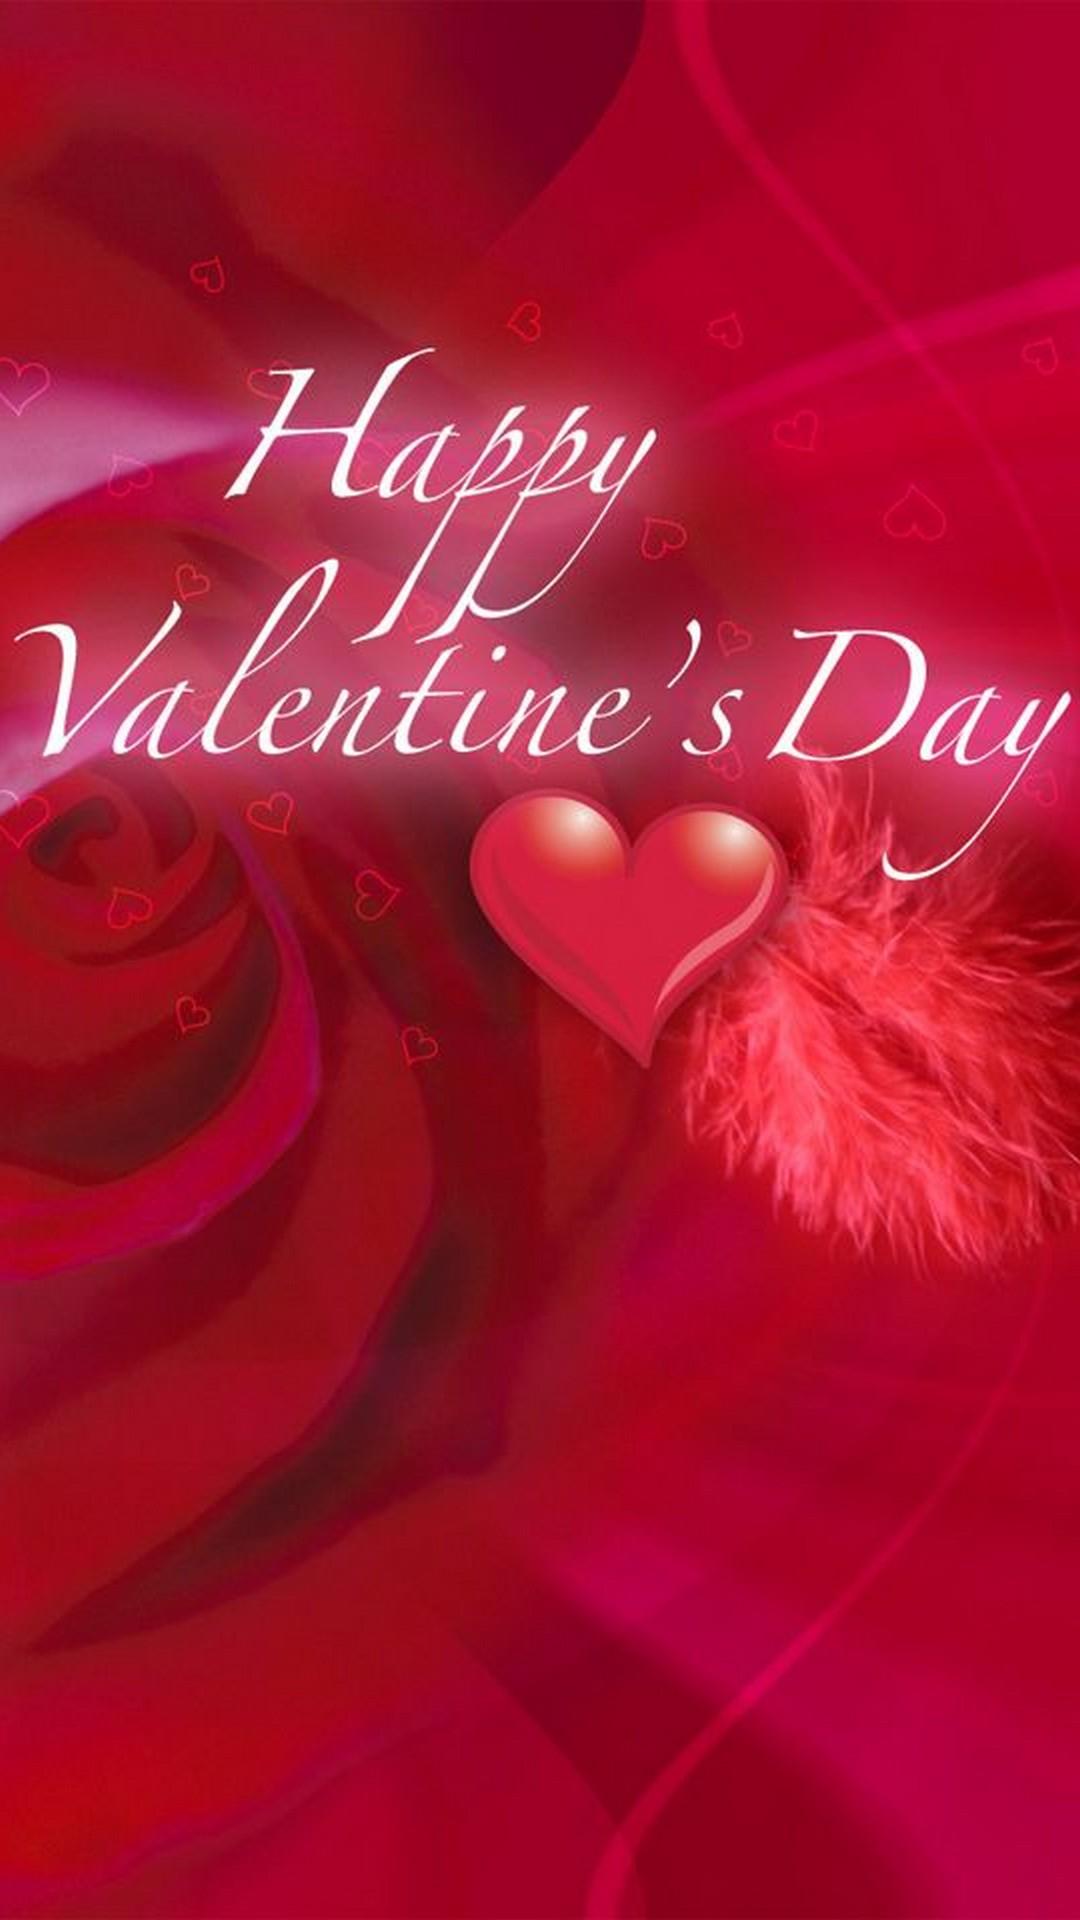 Best Happy Valentine Day iPhone Wallpaper 2021 3D iPhone Wallpaper 1080x1920